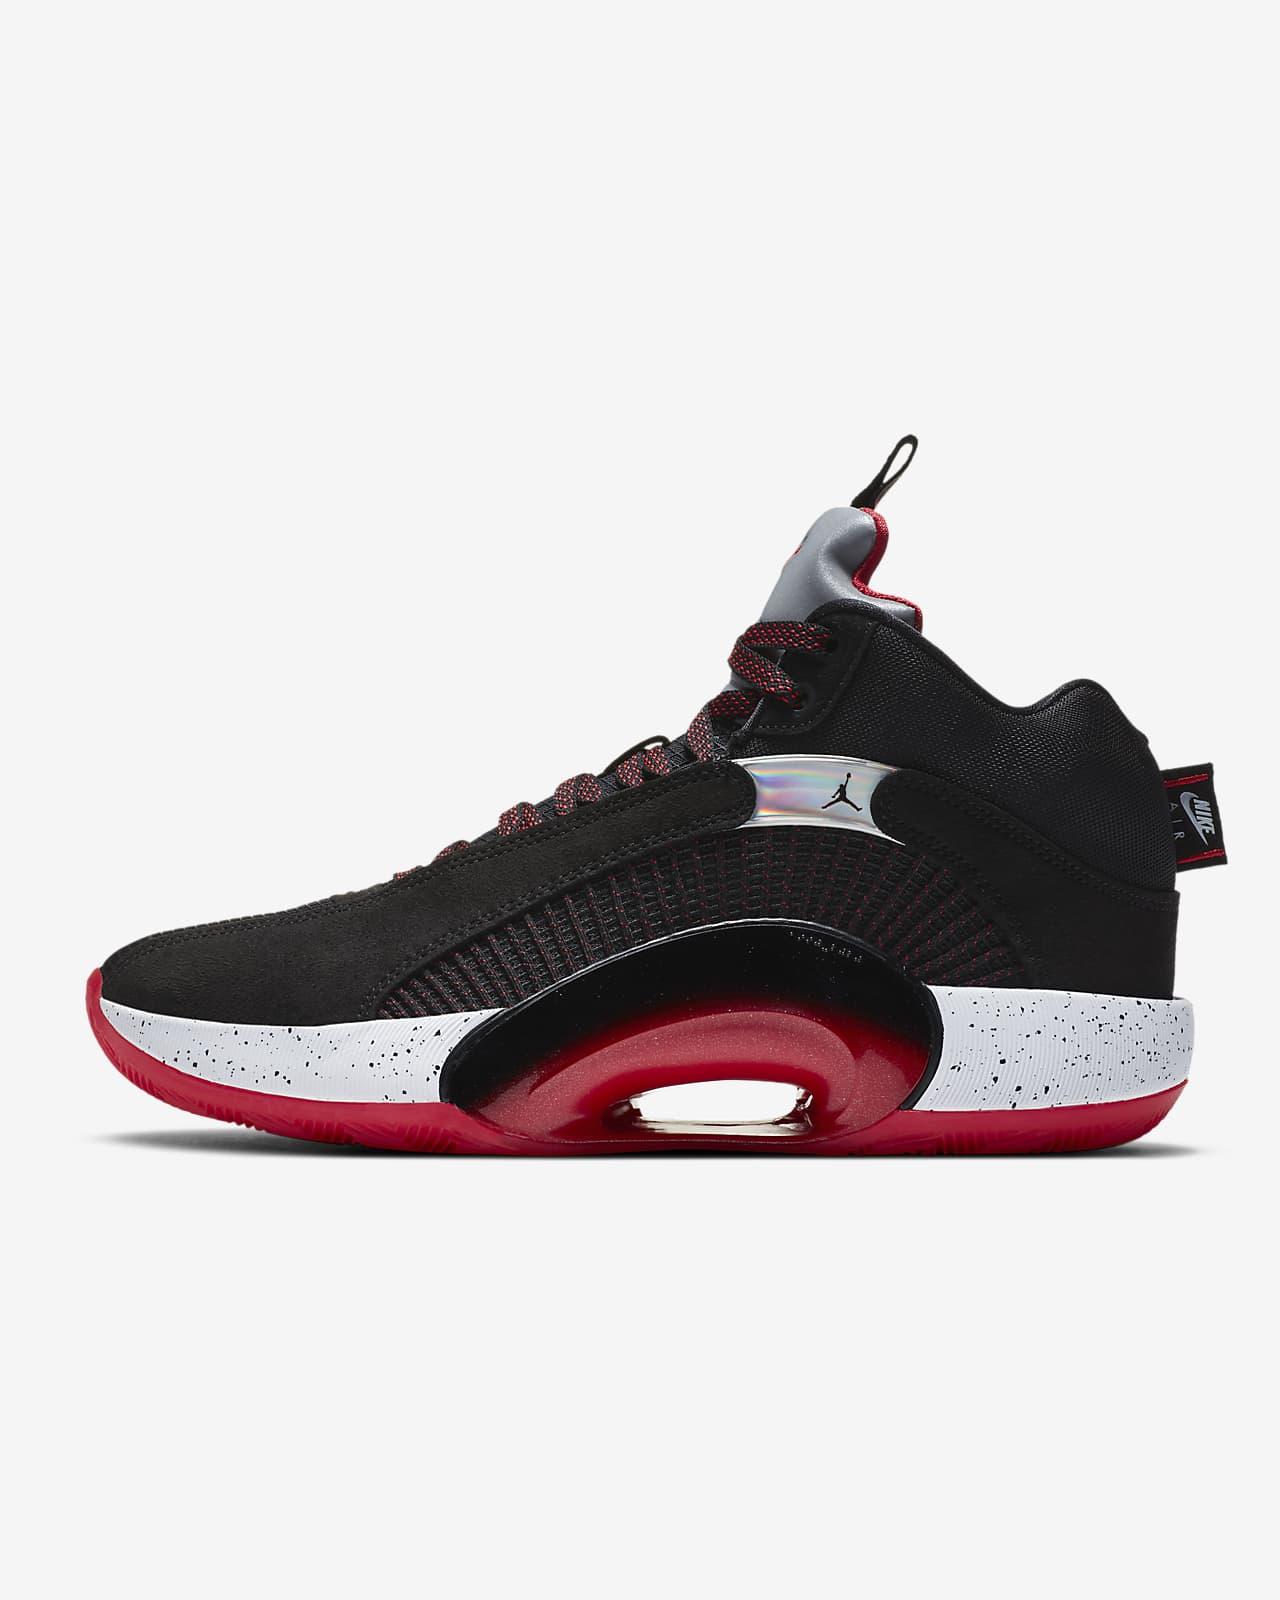 Air Jordan XXXV Basketball Shoe